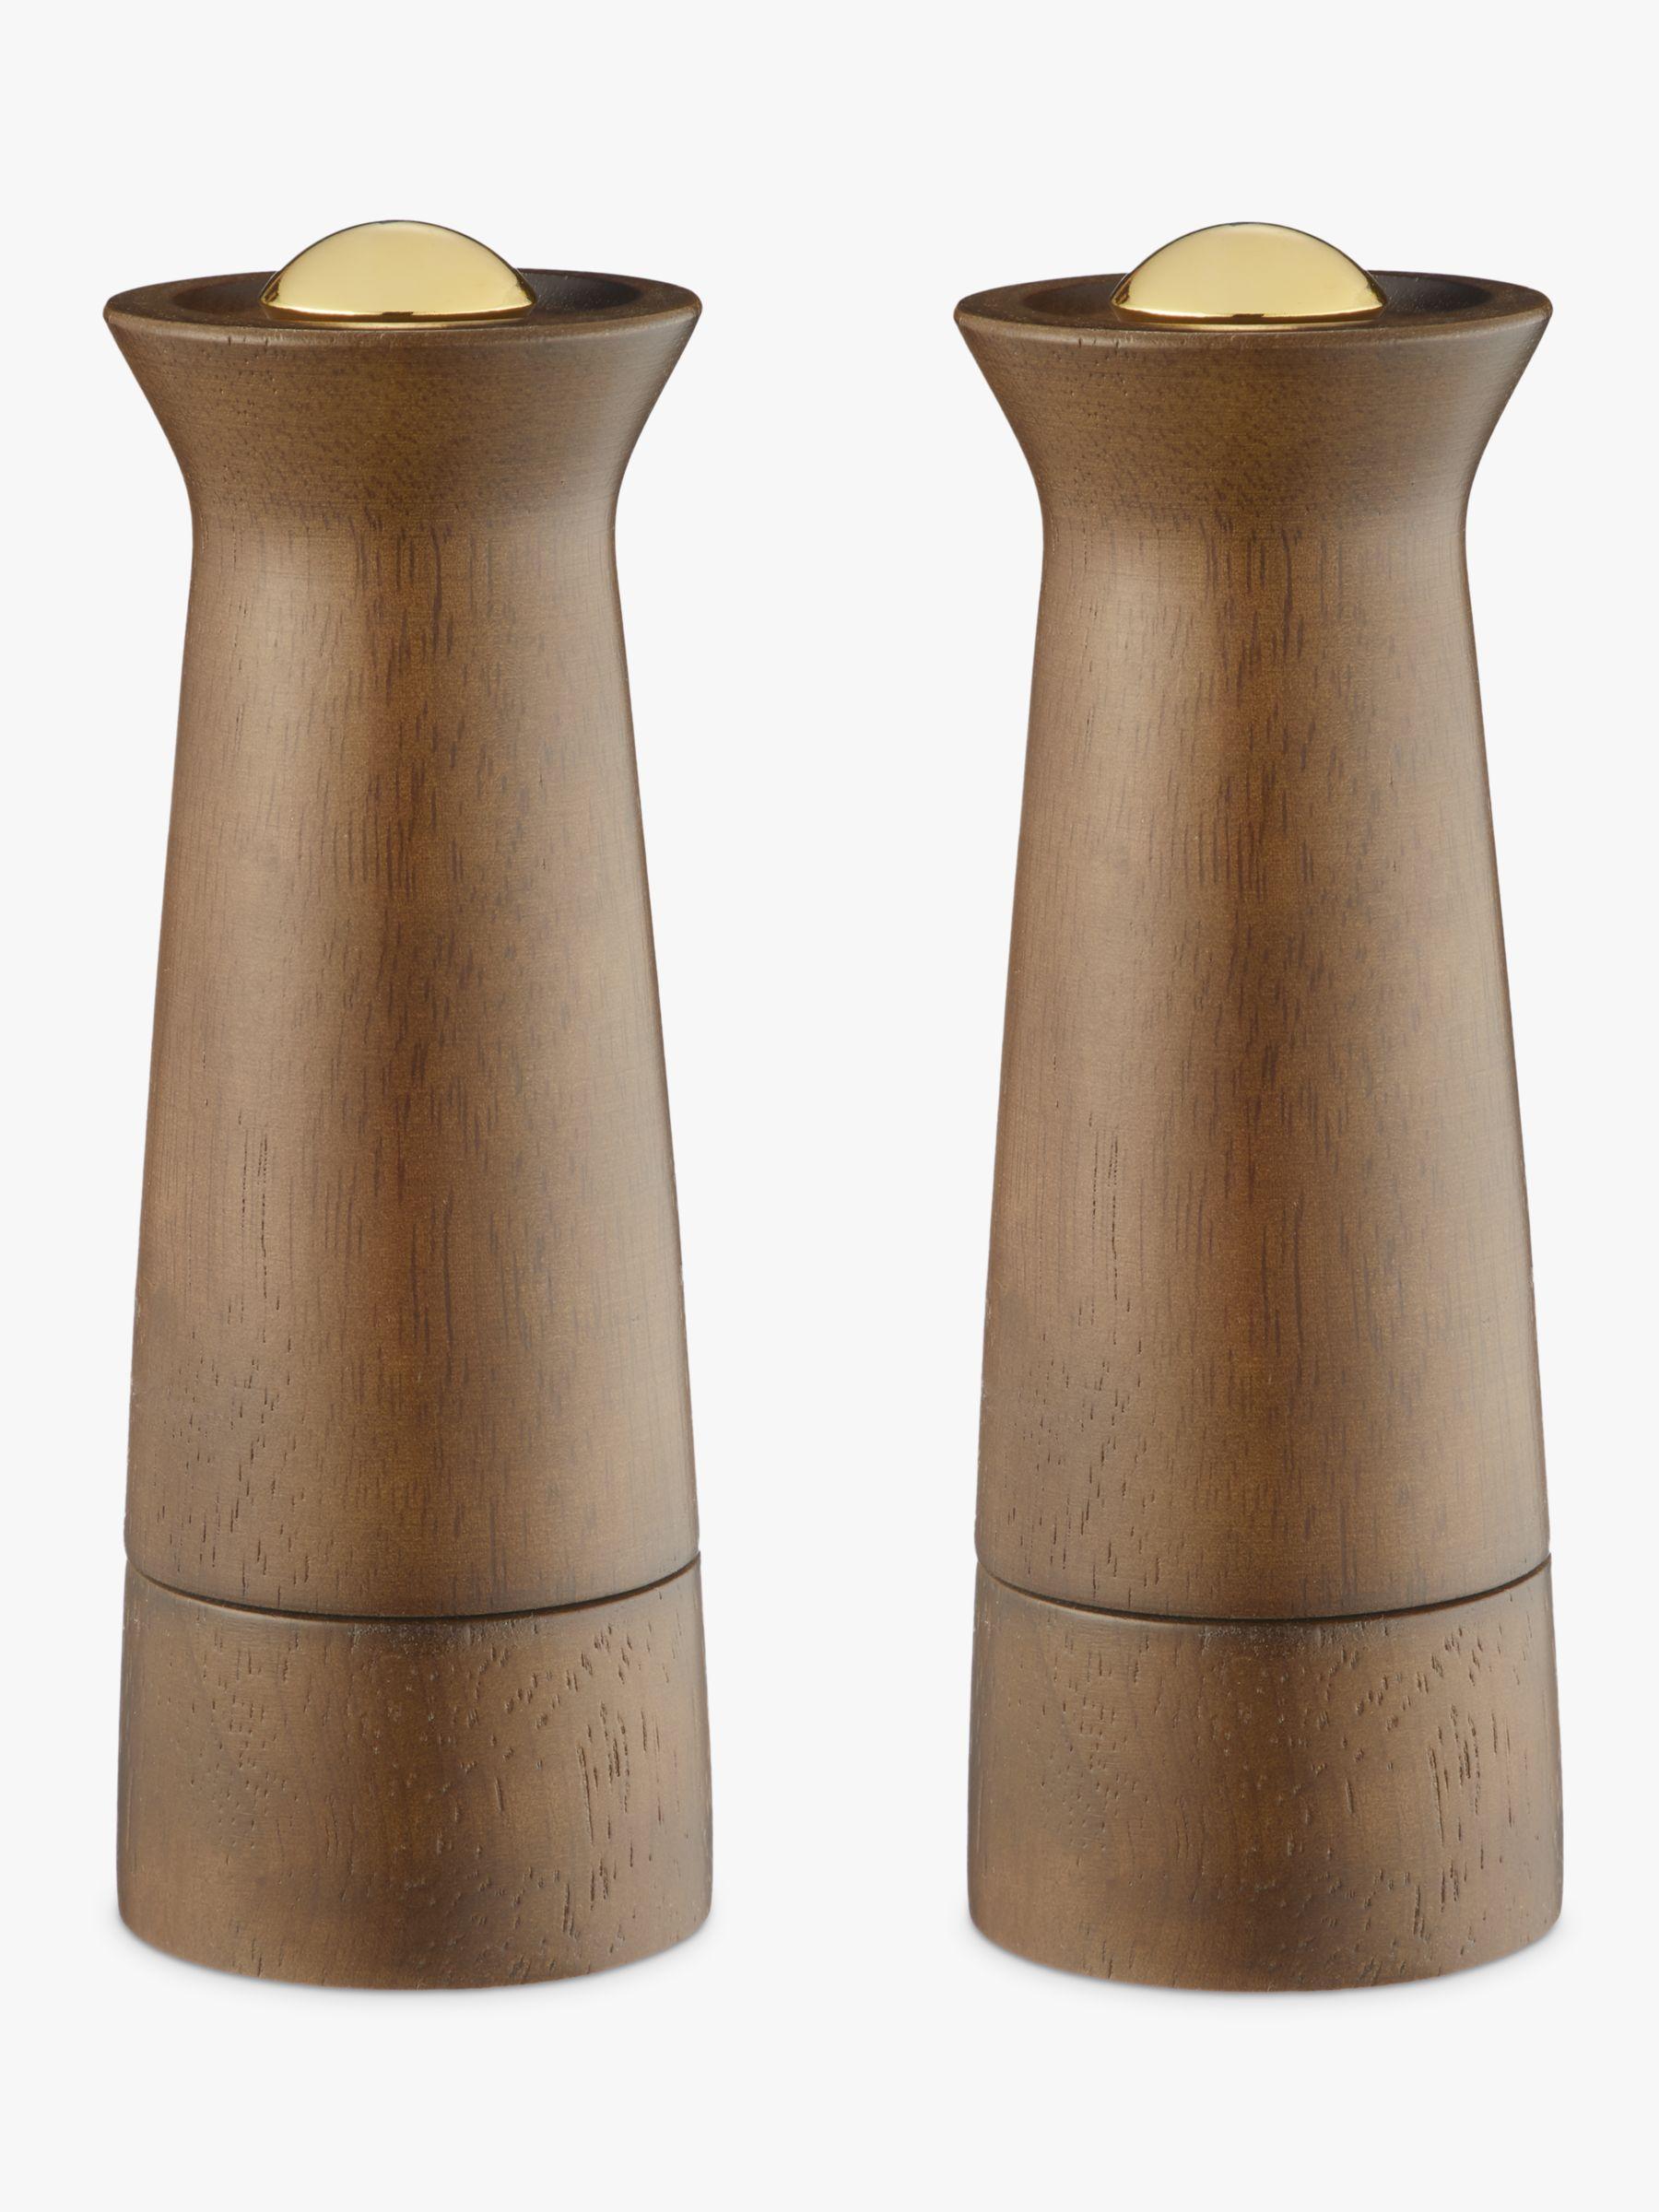 John Lewis Partners Forest Wood Salt And Pepper Mills Natural Brass Set Of 2 At John Lewis Partners